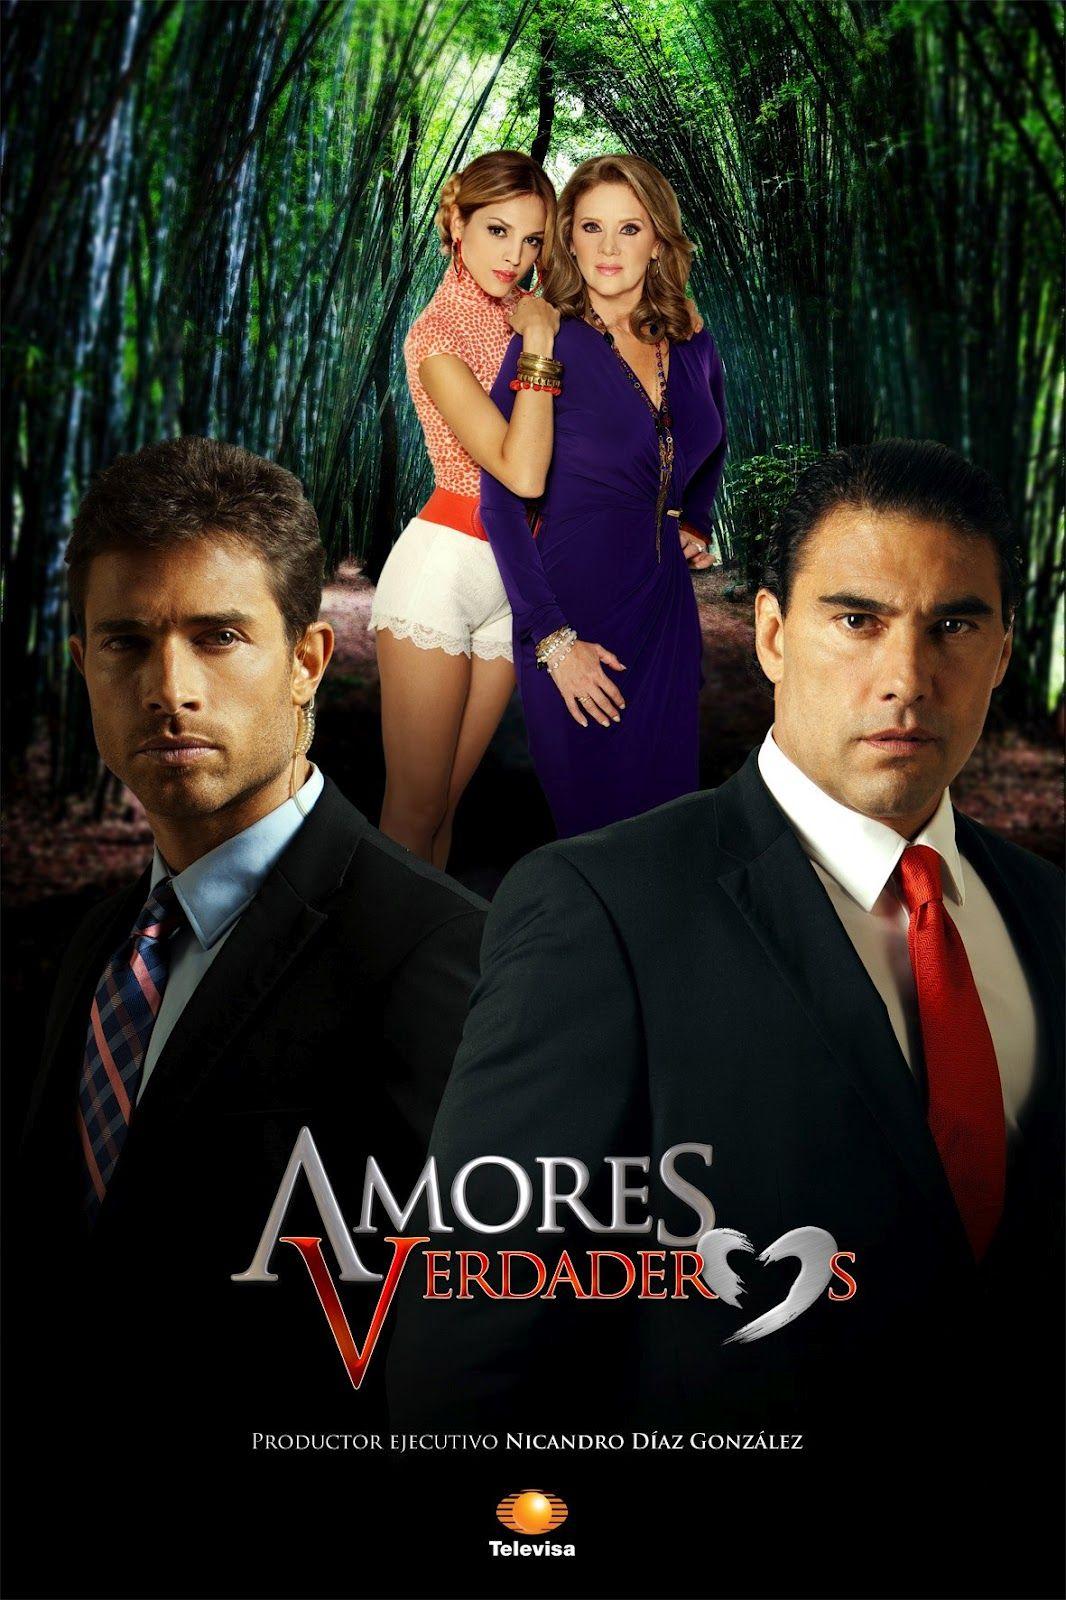 Amores Verdaderos Mexico 2012 Erika Buenfil Eduardo Yáñez Sebastián Rulli Eiza González Spanish Movies Telenovelas David Zepeda